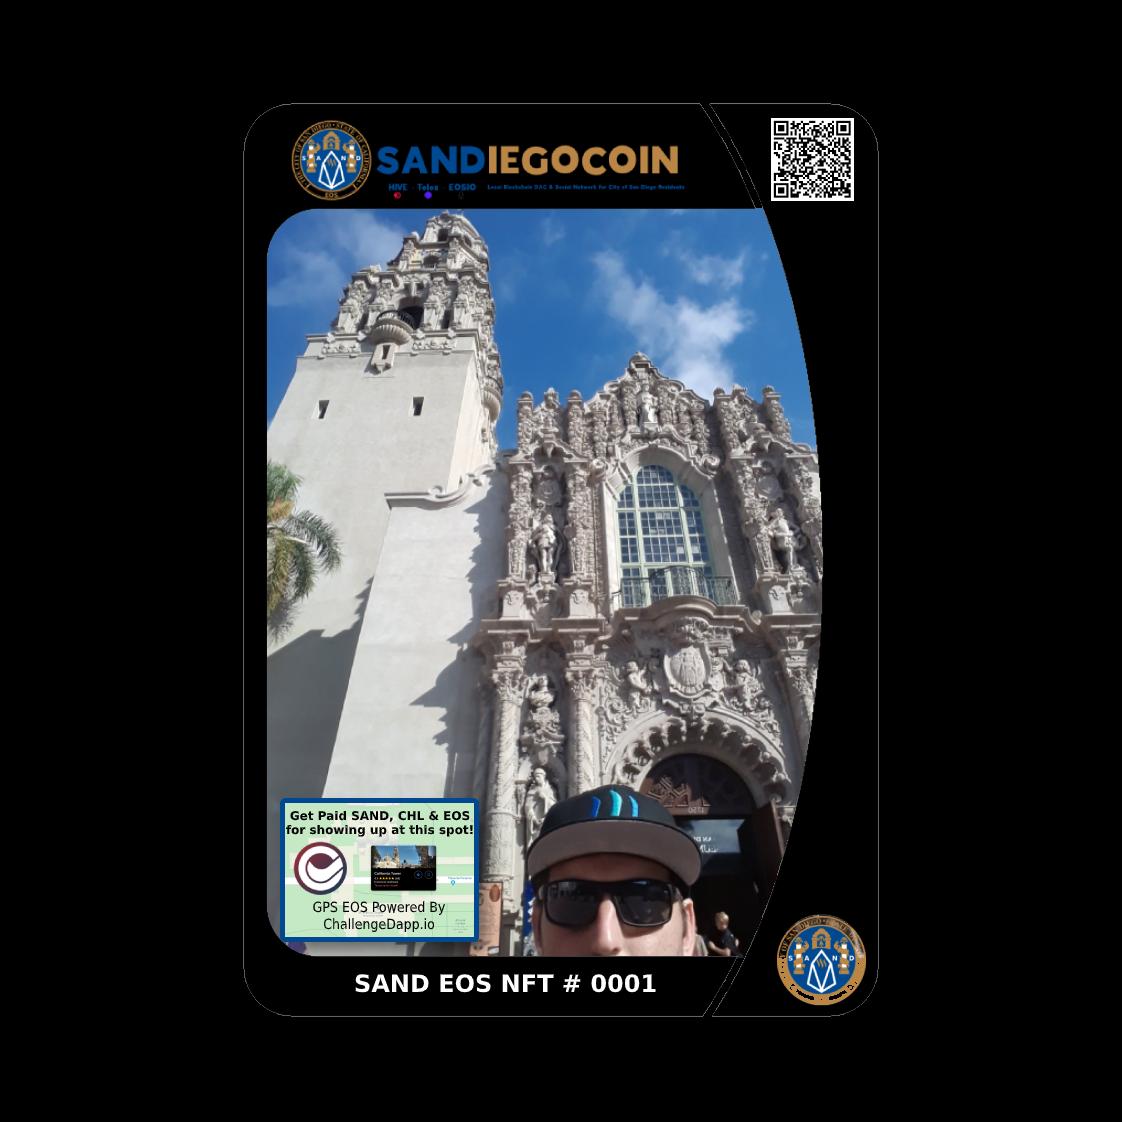 SANDEOSNFTBalboaPark0001-CARD-chl-qrcode.png